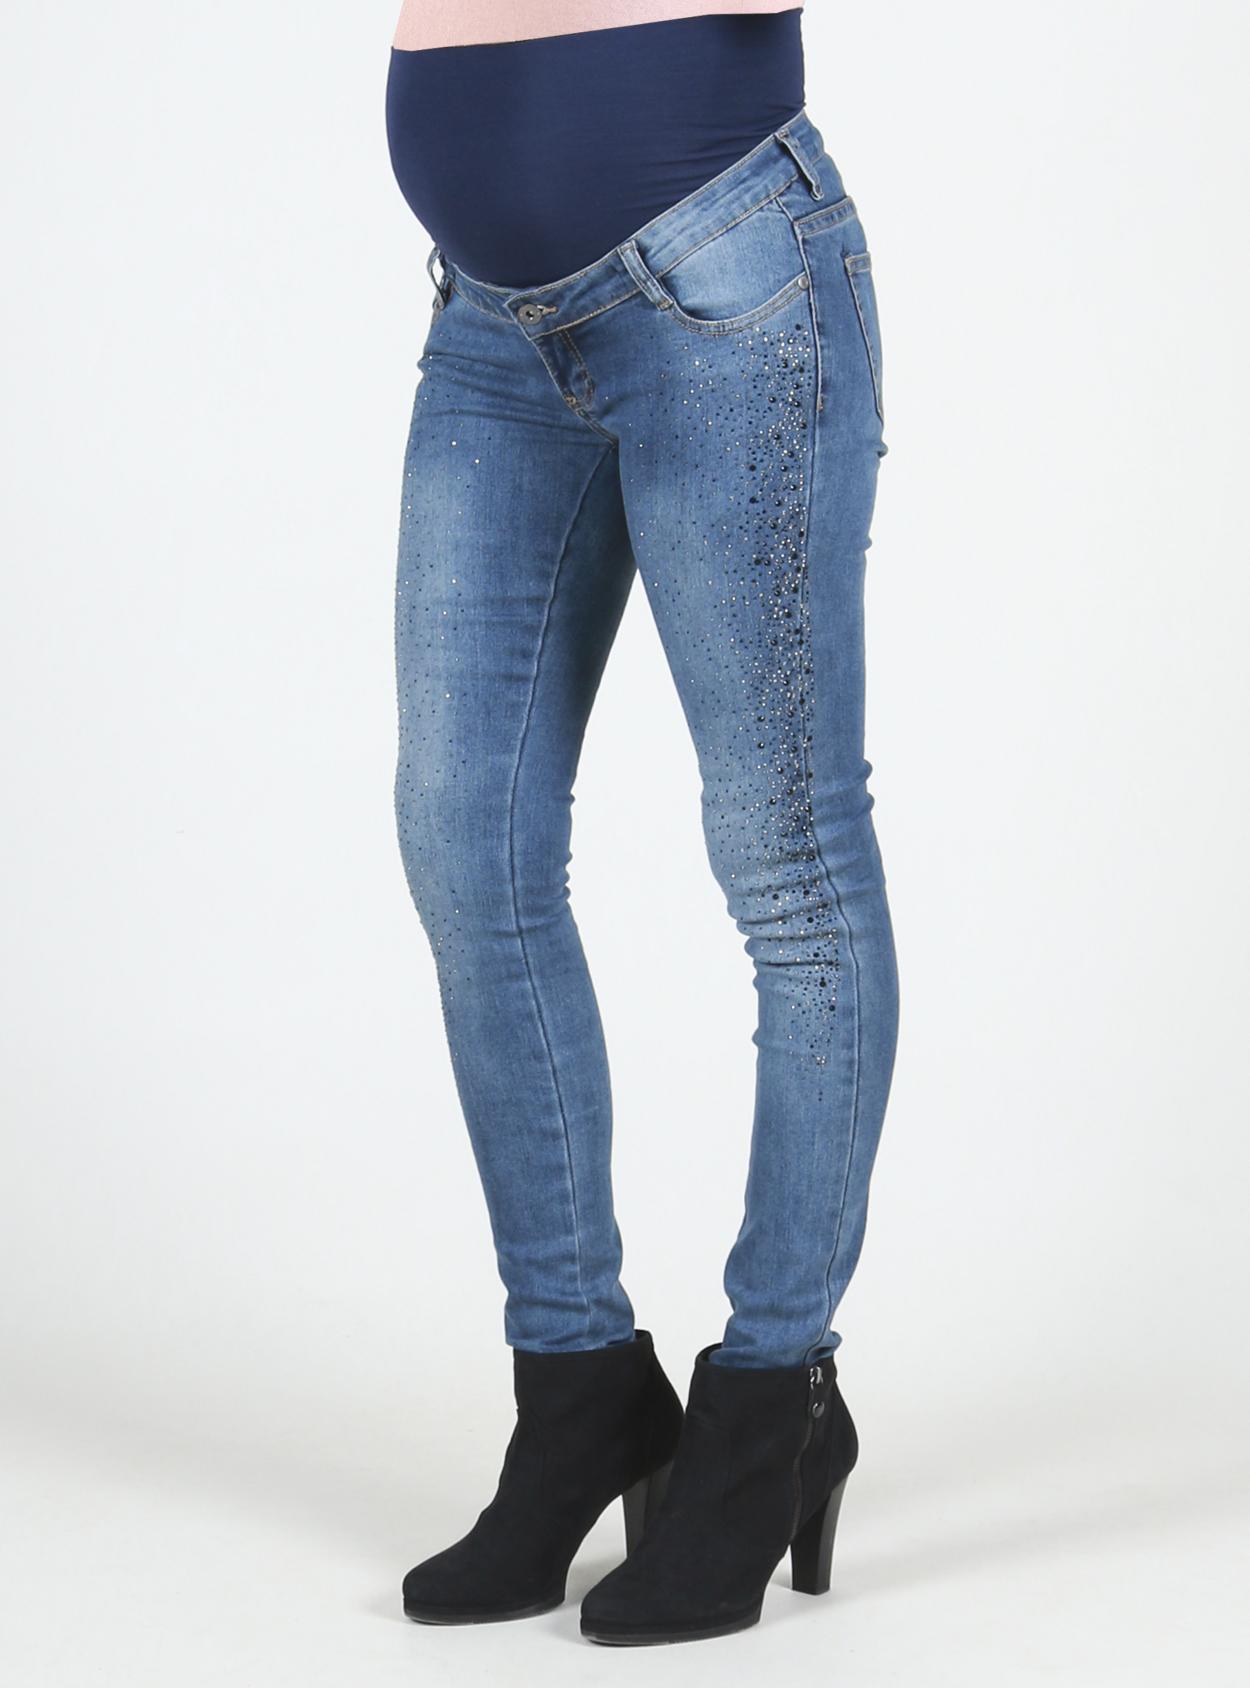 Jeans con pedrería